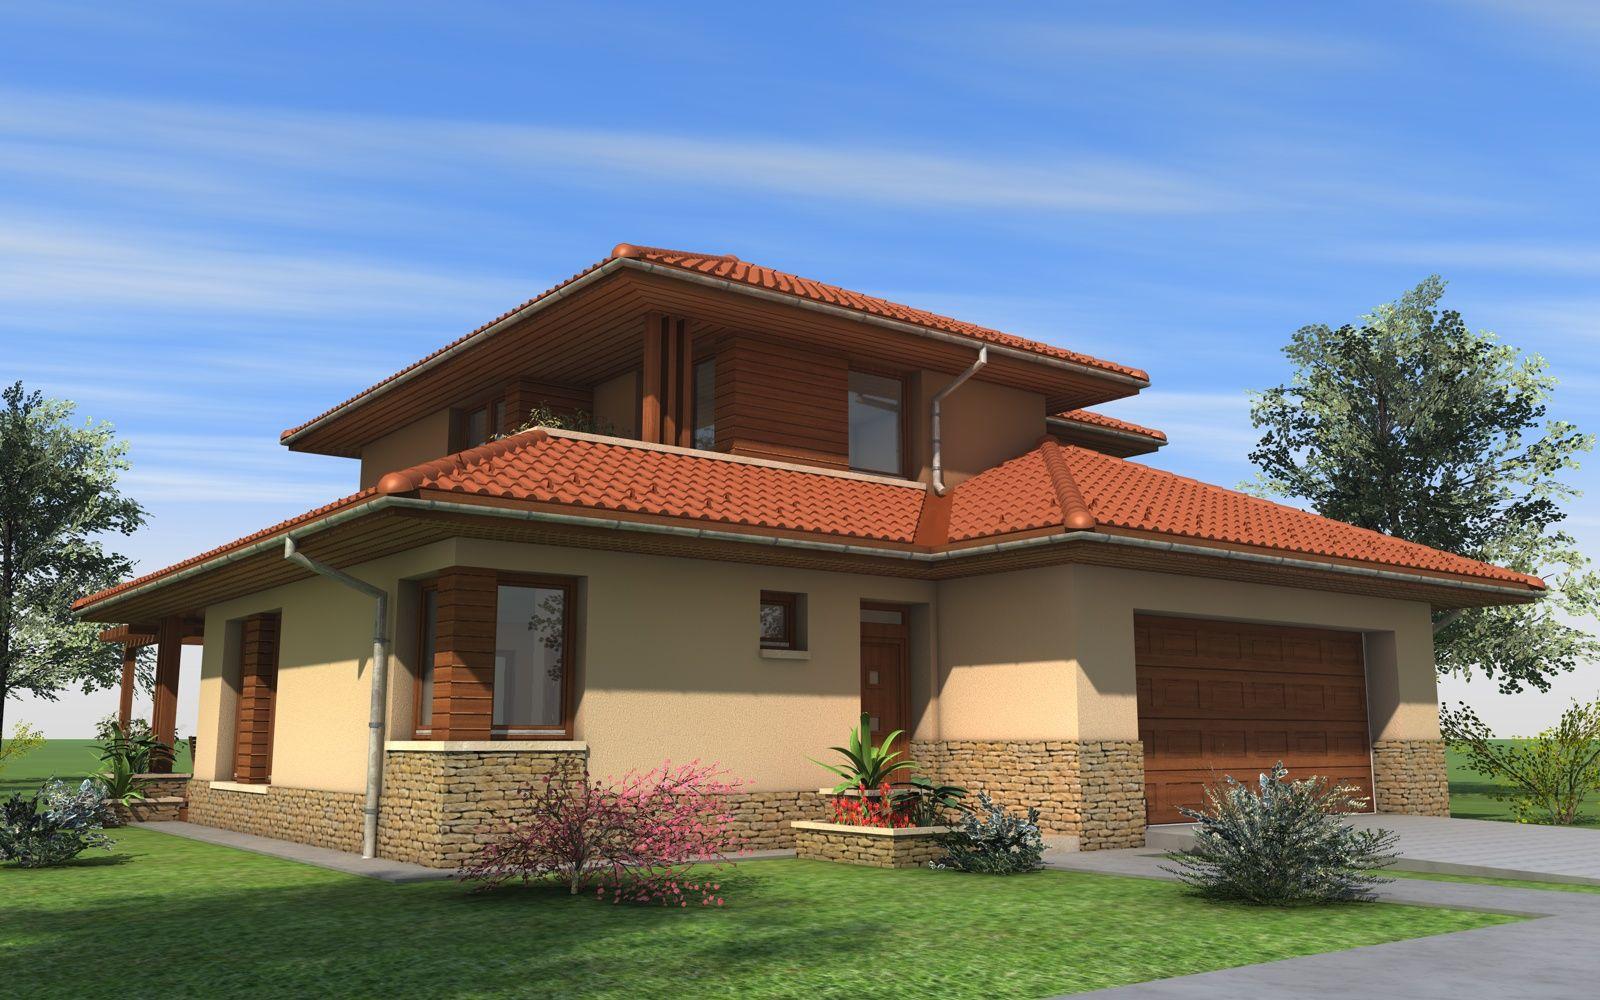 Home design bildergalerie emeletes családi ház  m  proyectos que debo intentar